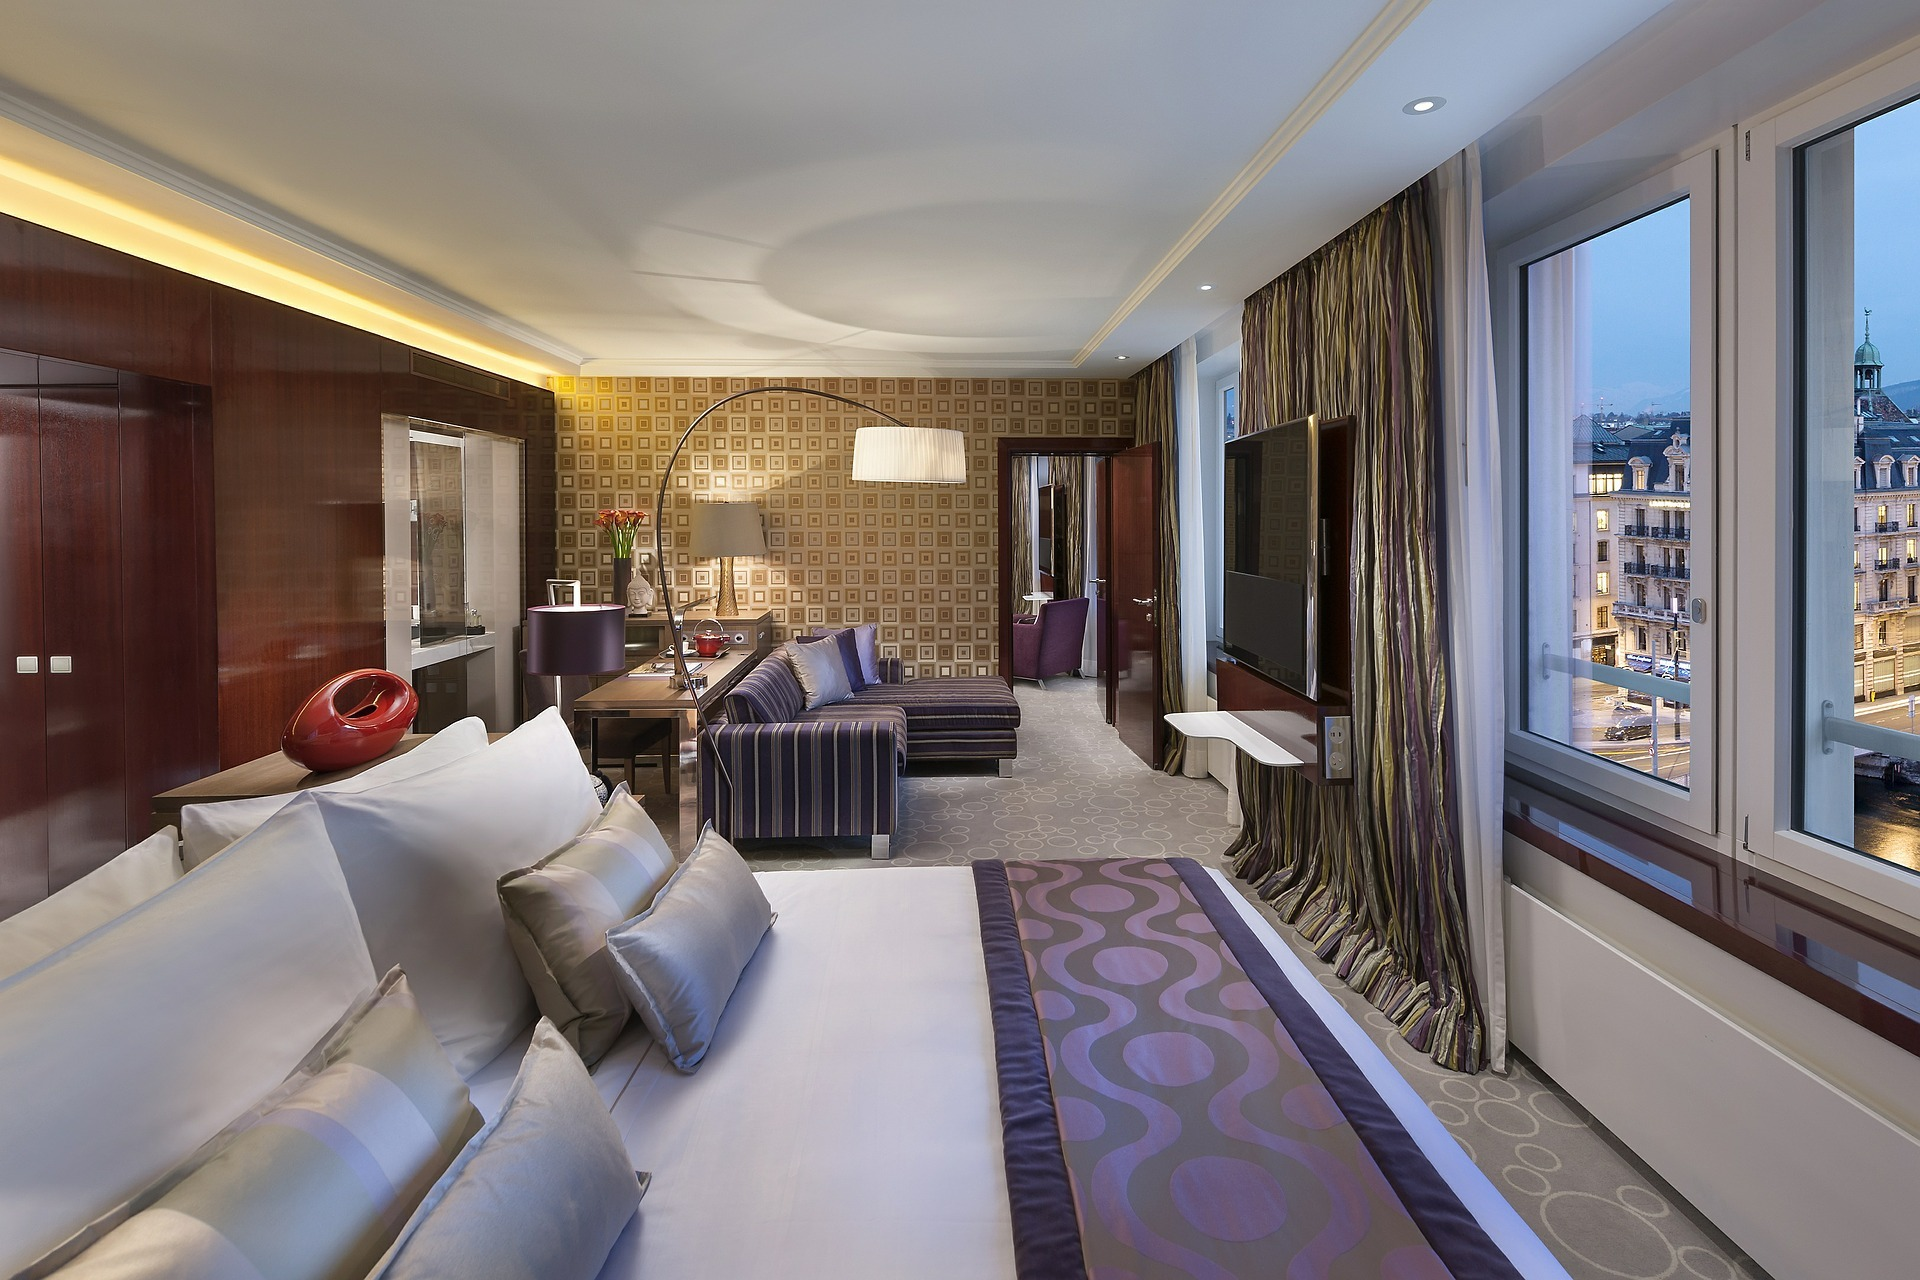 hotel-595121_1920.jpg